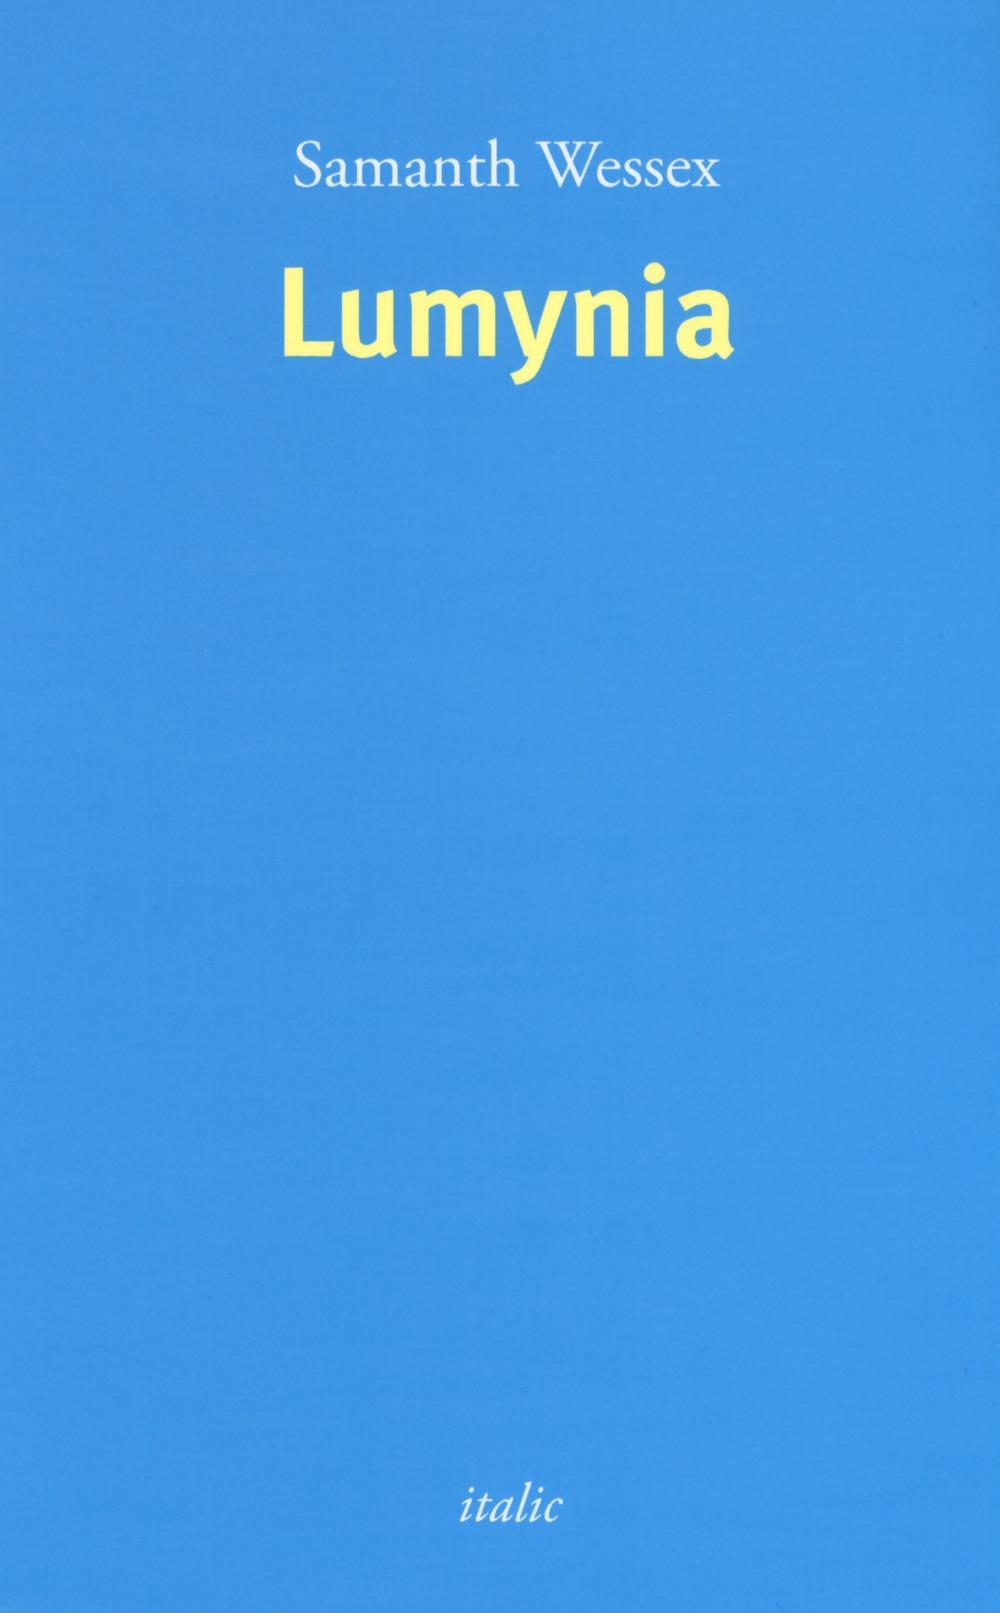 Lumynia